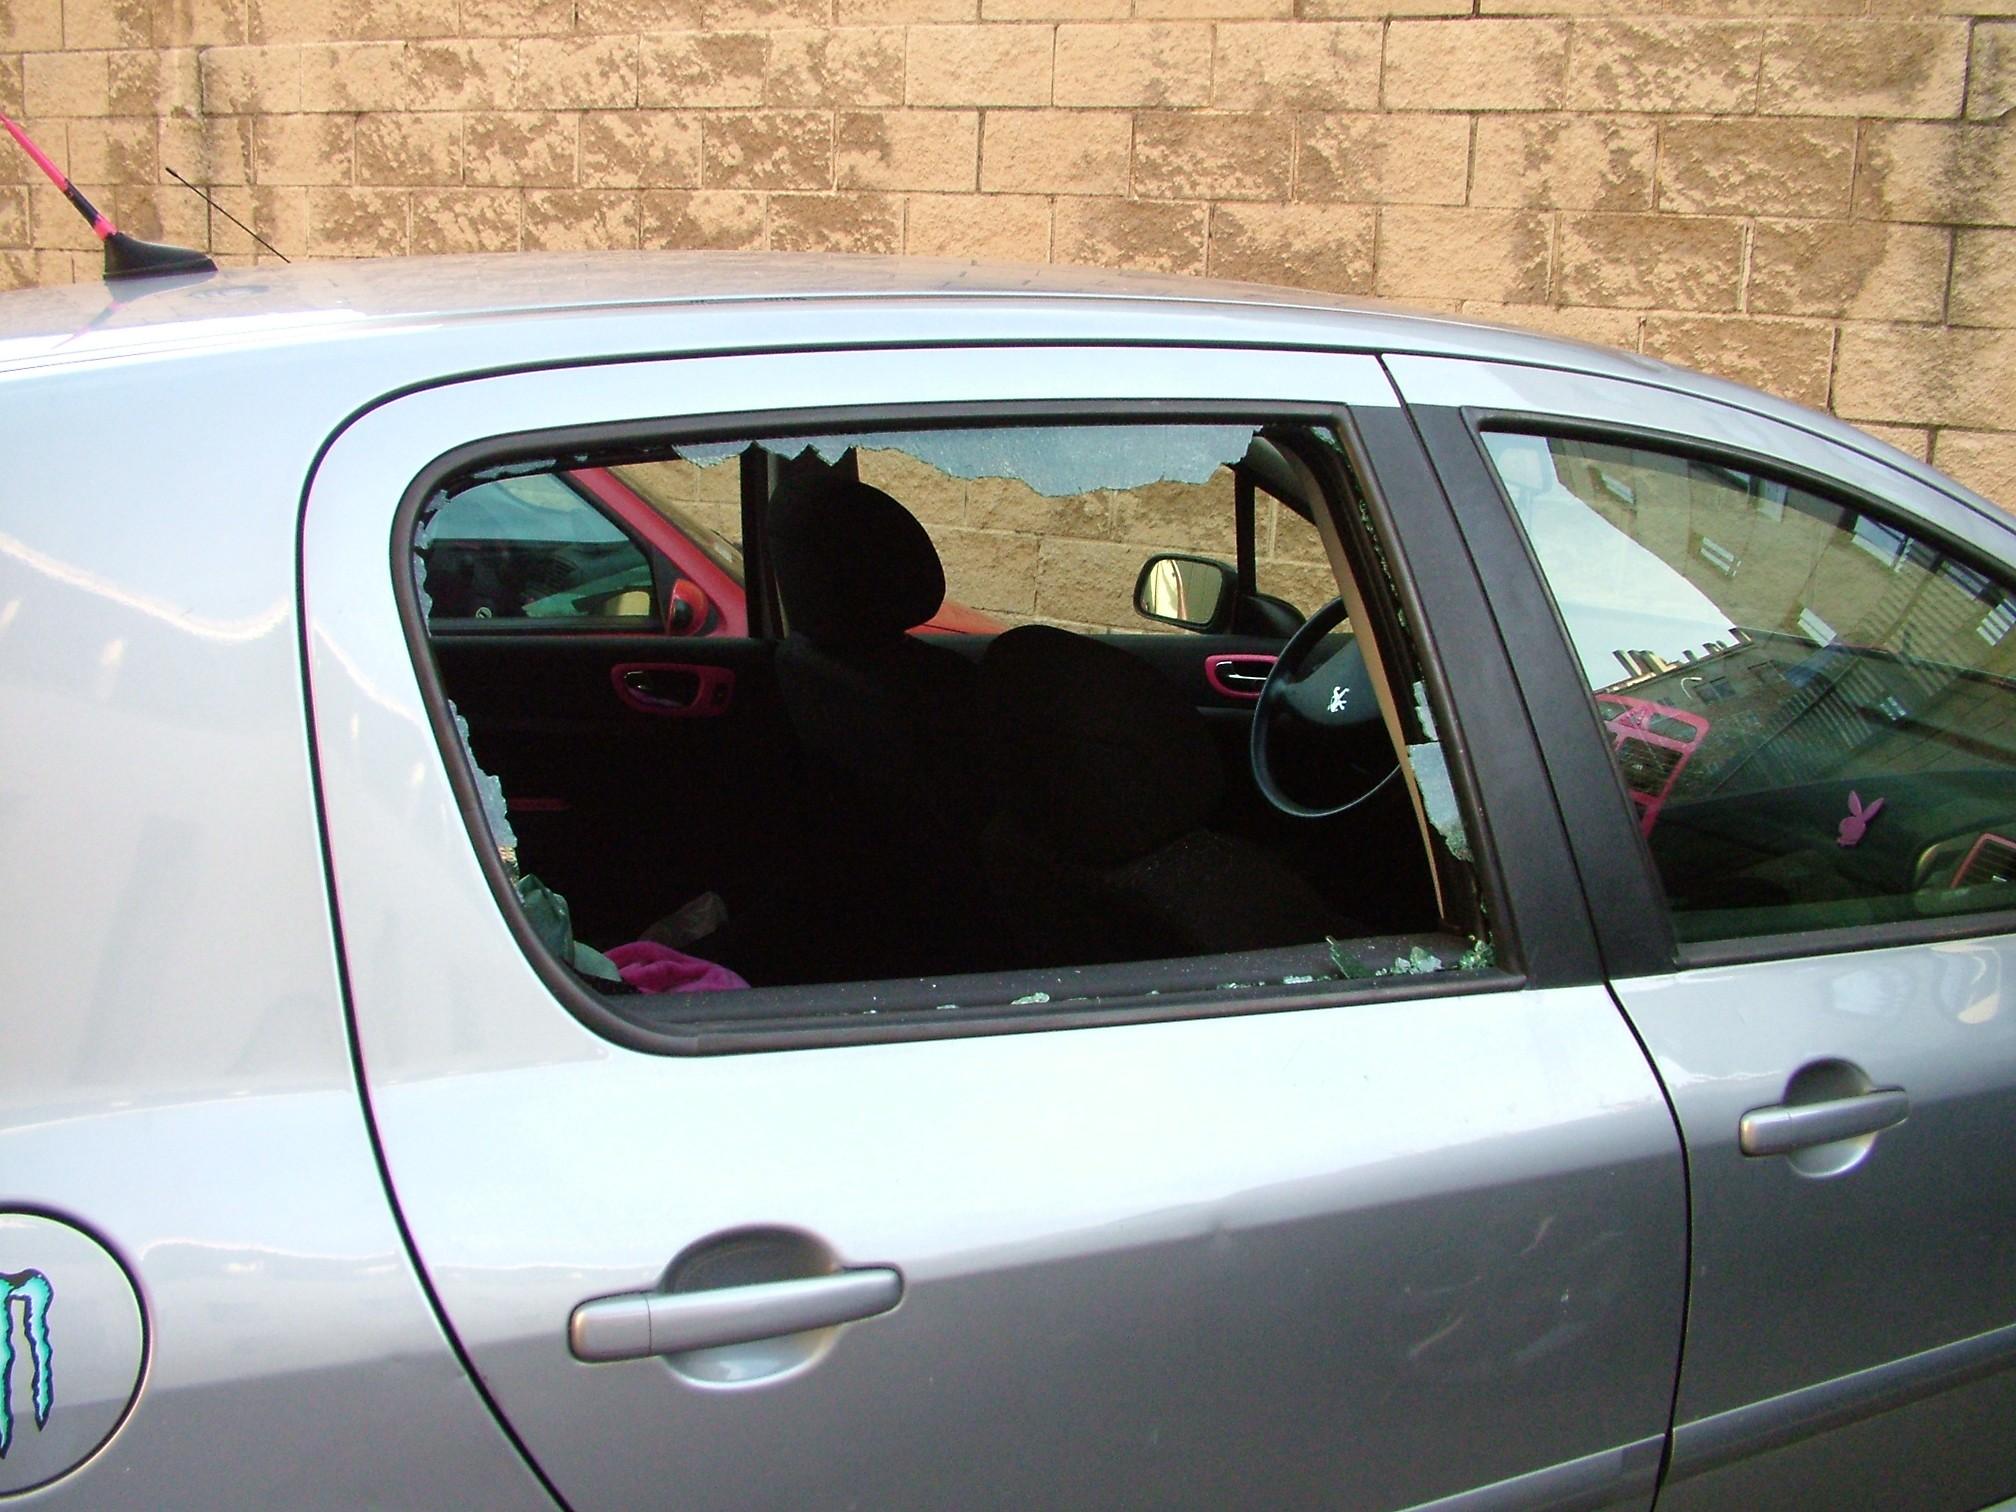 2014-06-20 ventana fracturada en vehiculo